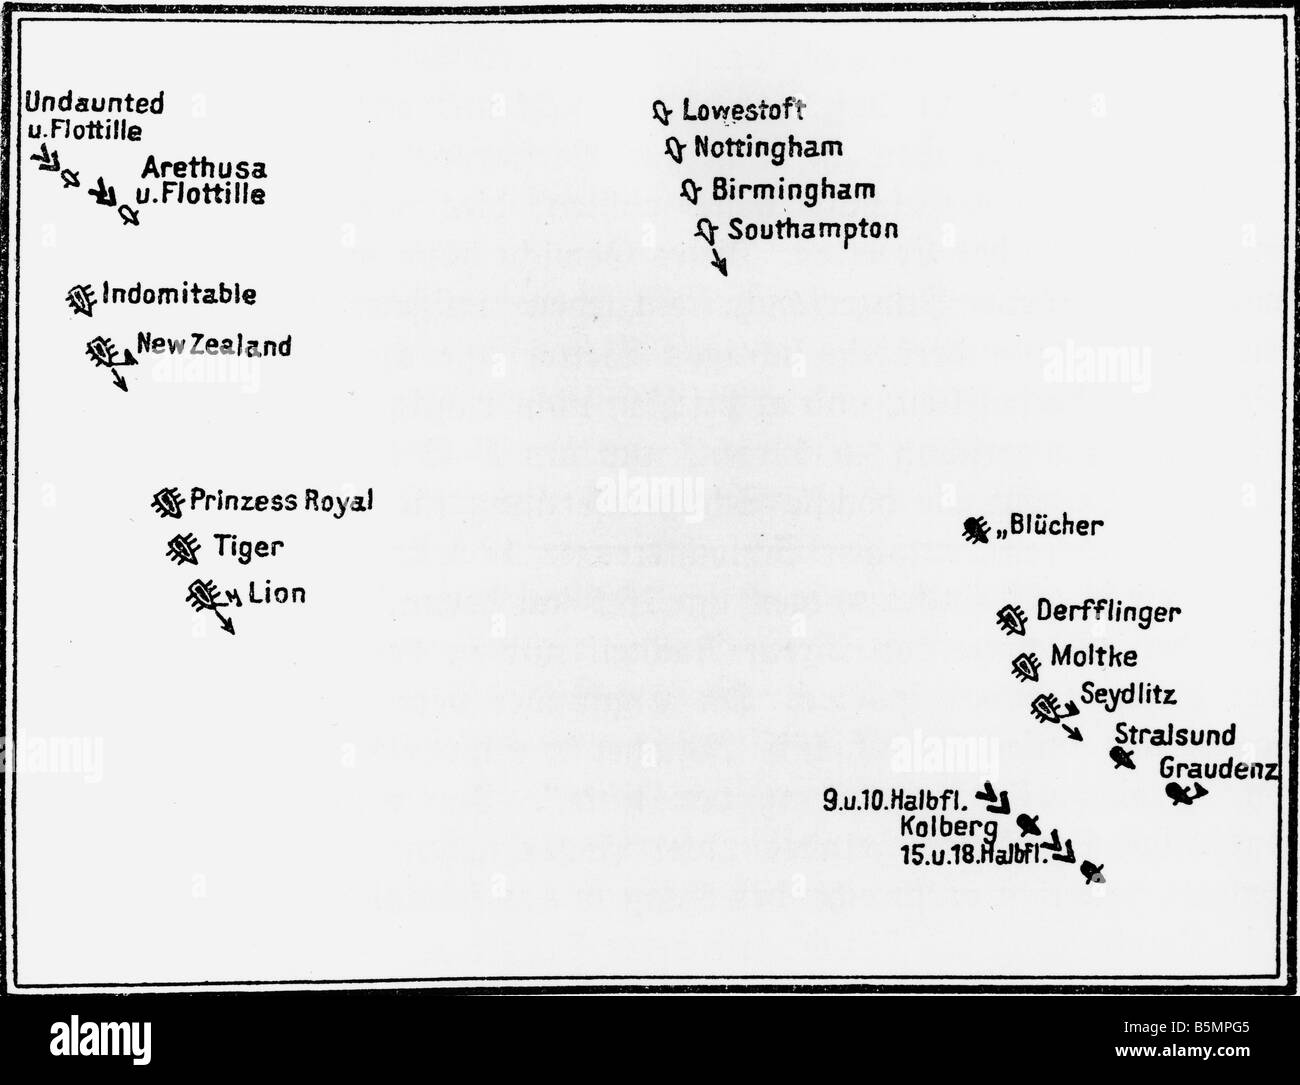 9 1915 1 24 F1 Naval battle Helgoland 1915 Skizze Weltkrieg 1914-18 1 Seekrieg schweren Kampf zwischen deutschen Stockbild